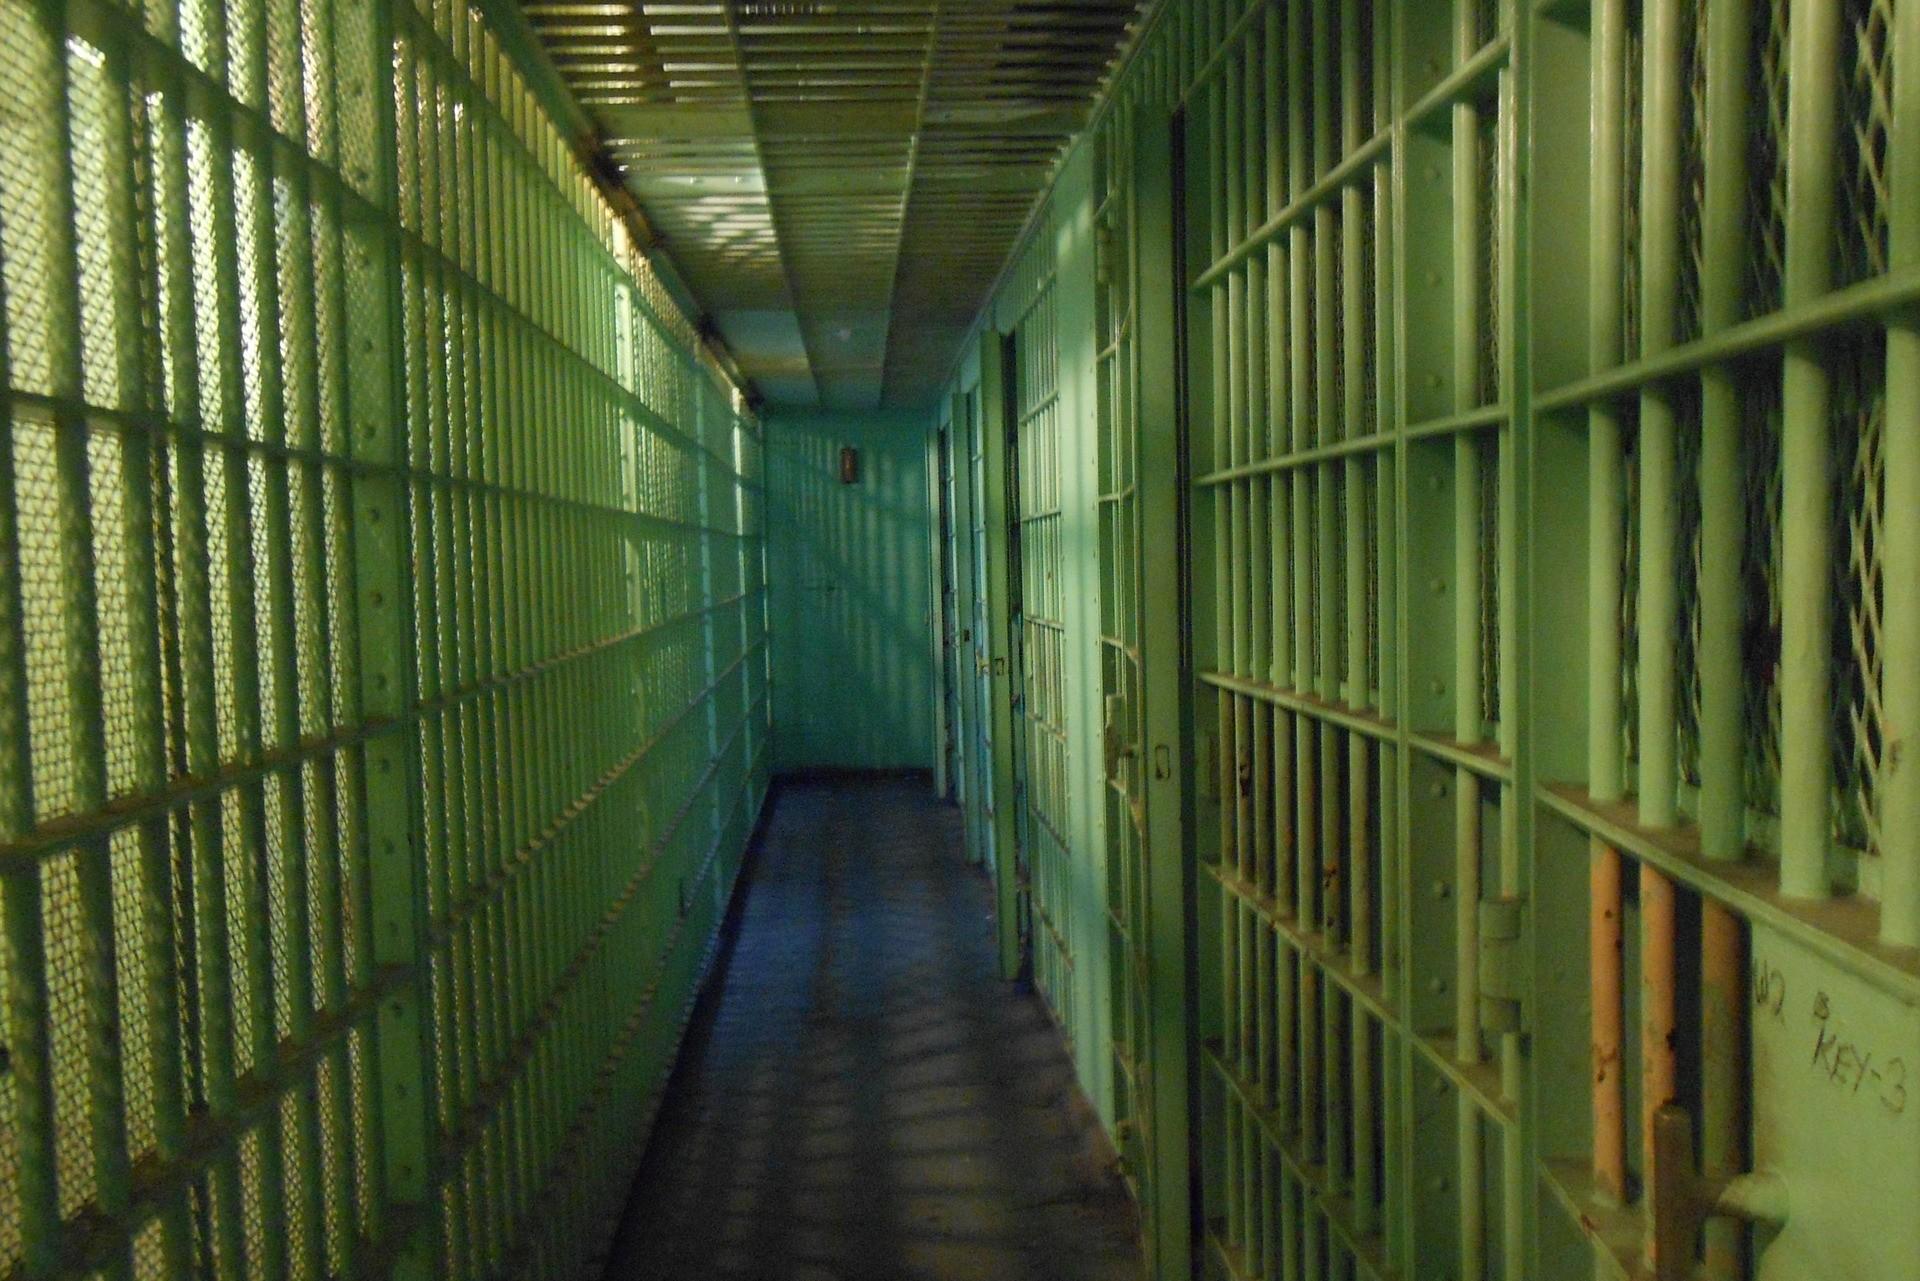 bol.com | The Buddha in Jail | 9781949017137 | Cuong Lu | Boeken | 1281x1920